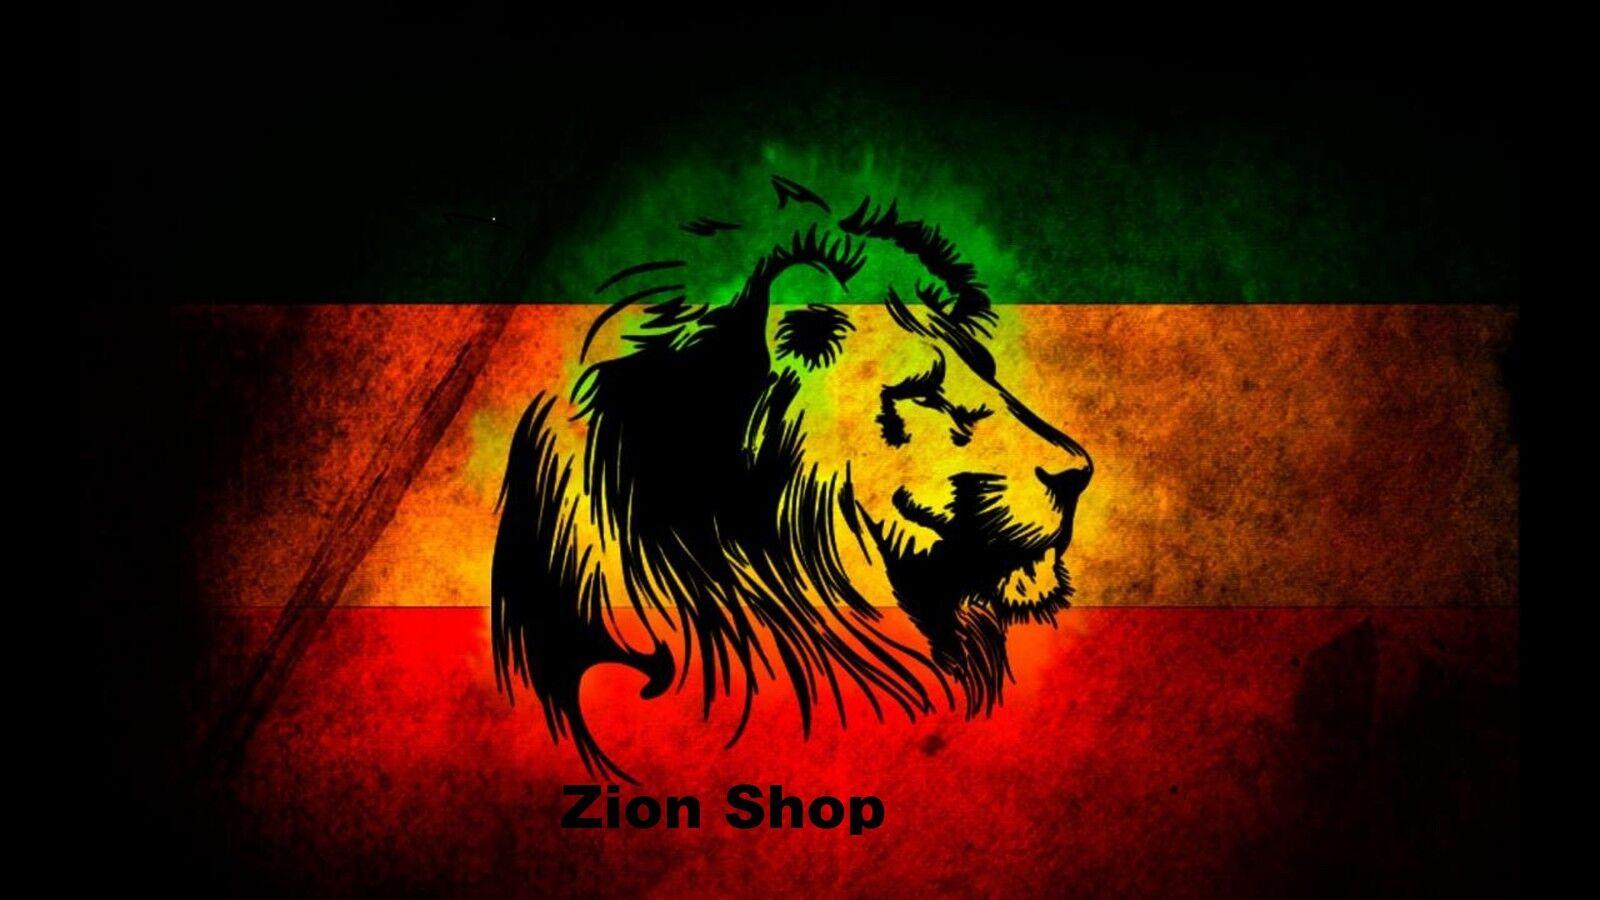 Nancy´s Zion Shop